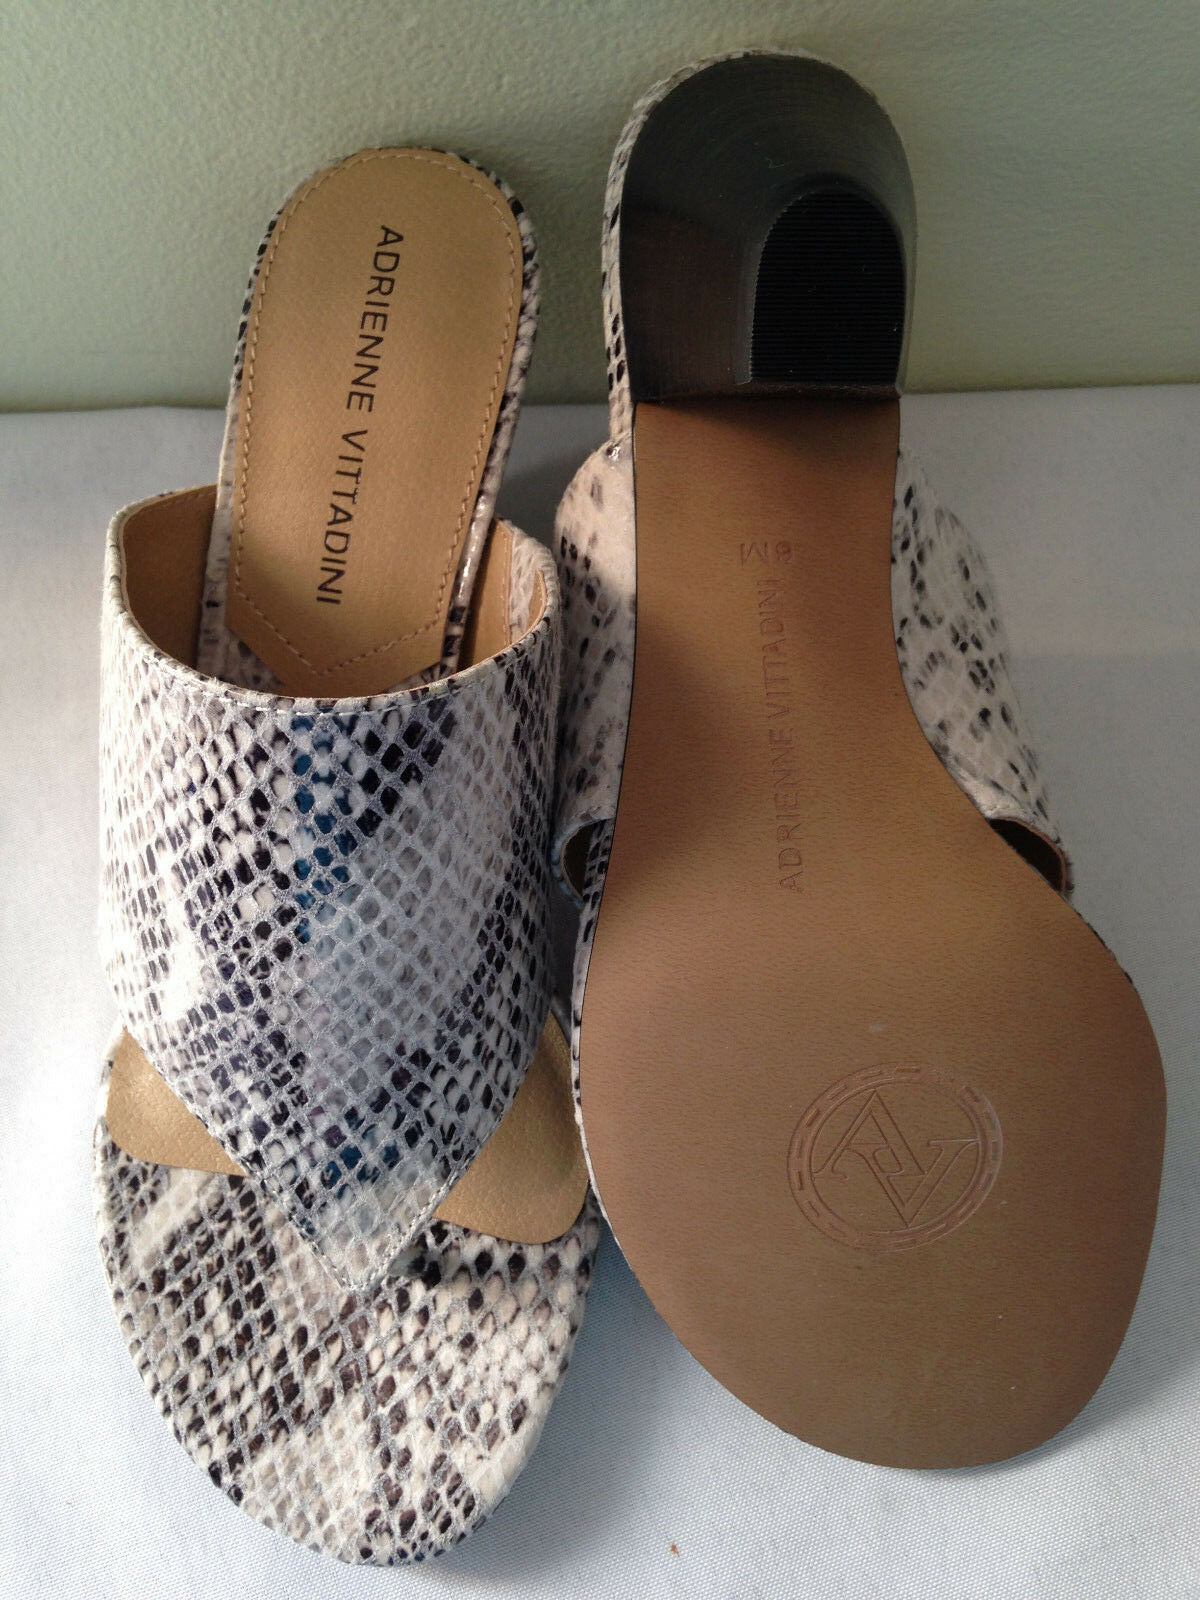 NIB Adrienne Vittadini PRUSHA Gorgeous Leder Snakeskin M Print Thong Sandales 6 M Snakeskin 8f579b